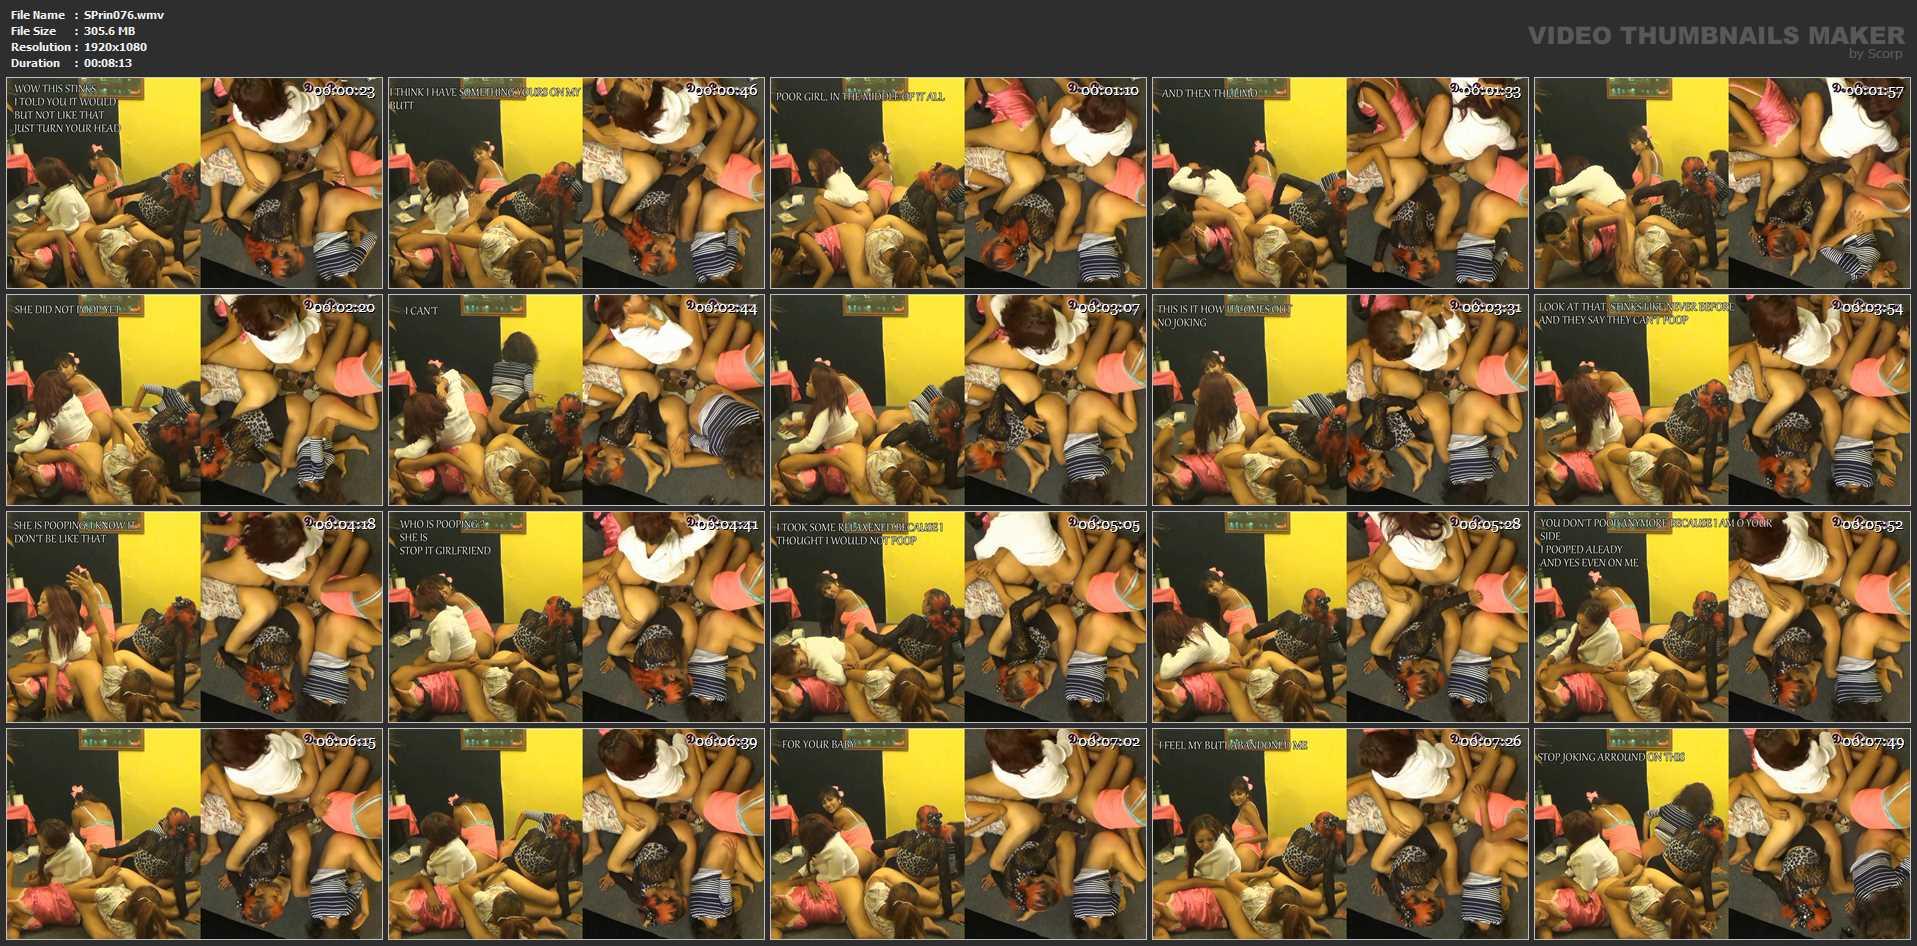 [SCAT-PRINCESS] Birdview III Part 4 Carmen [FULL HD][1080p][WMV]